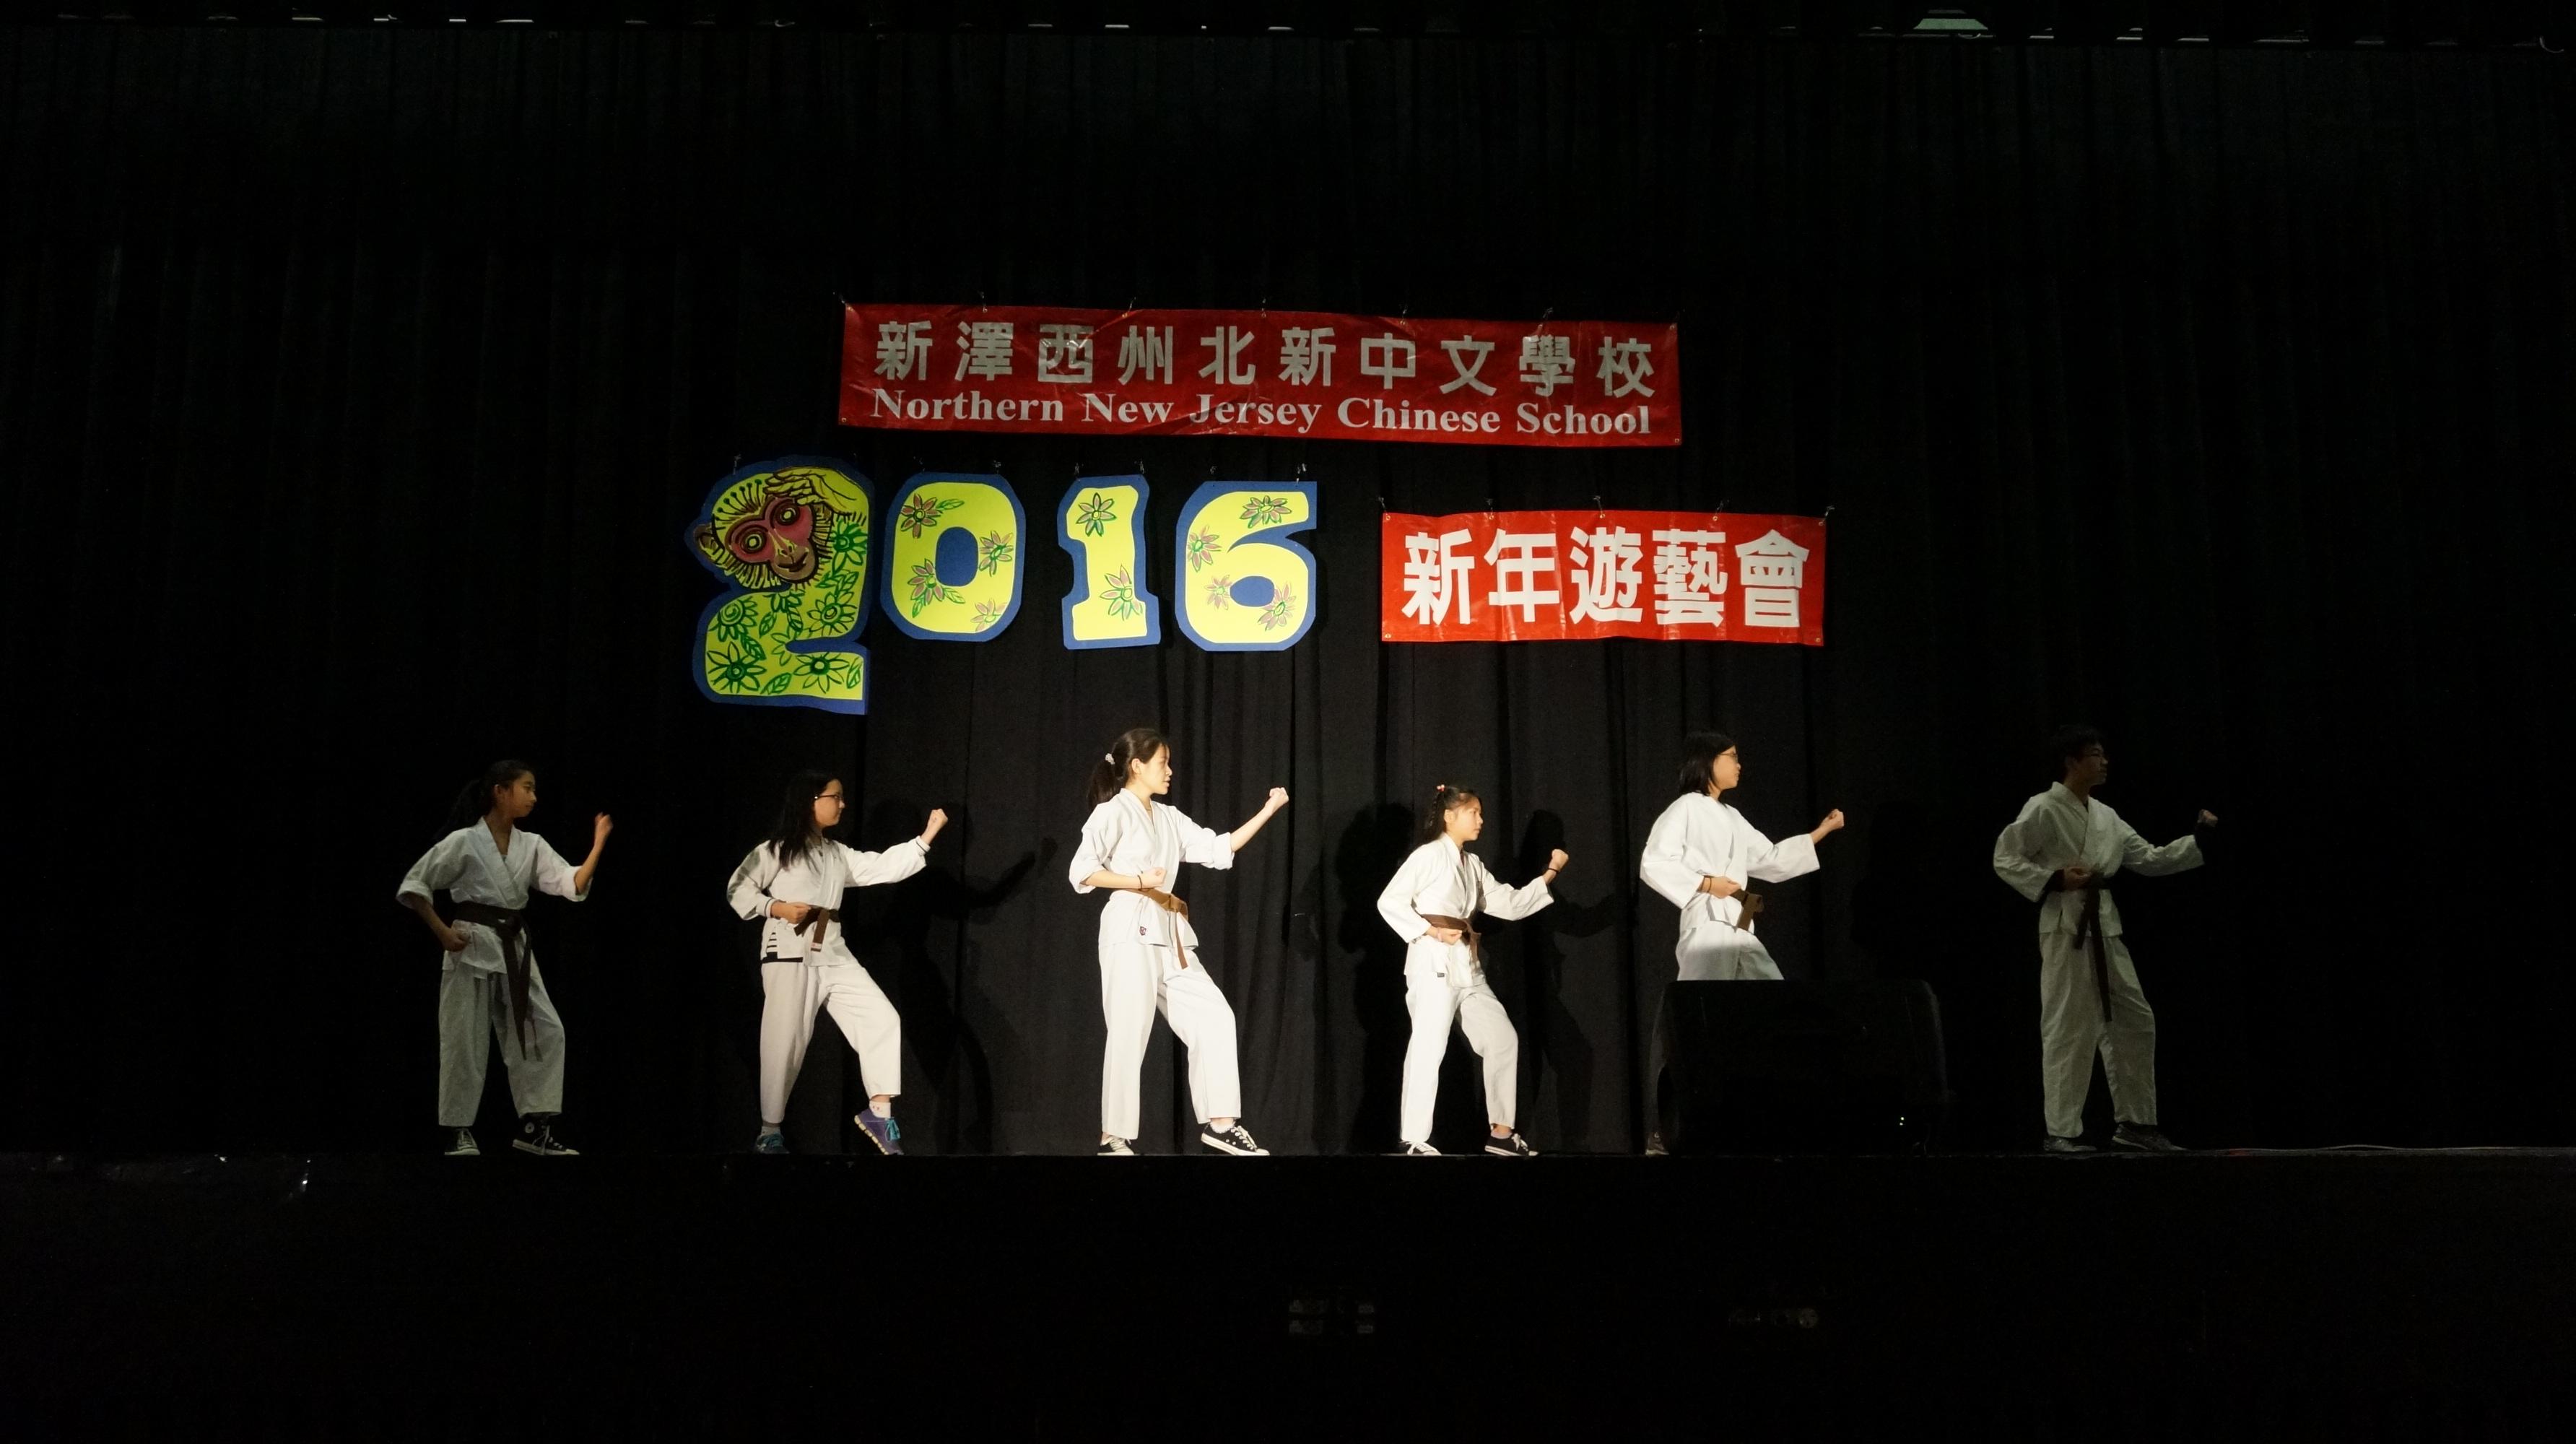 46e1be507d8267b2d903_aaa_Chinese_New_Year_pix_413.JPG